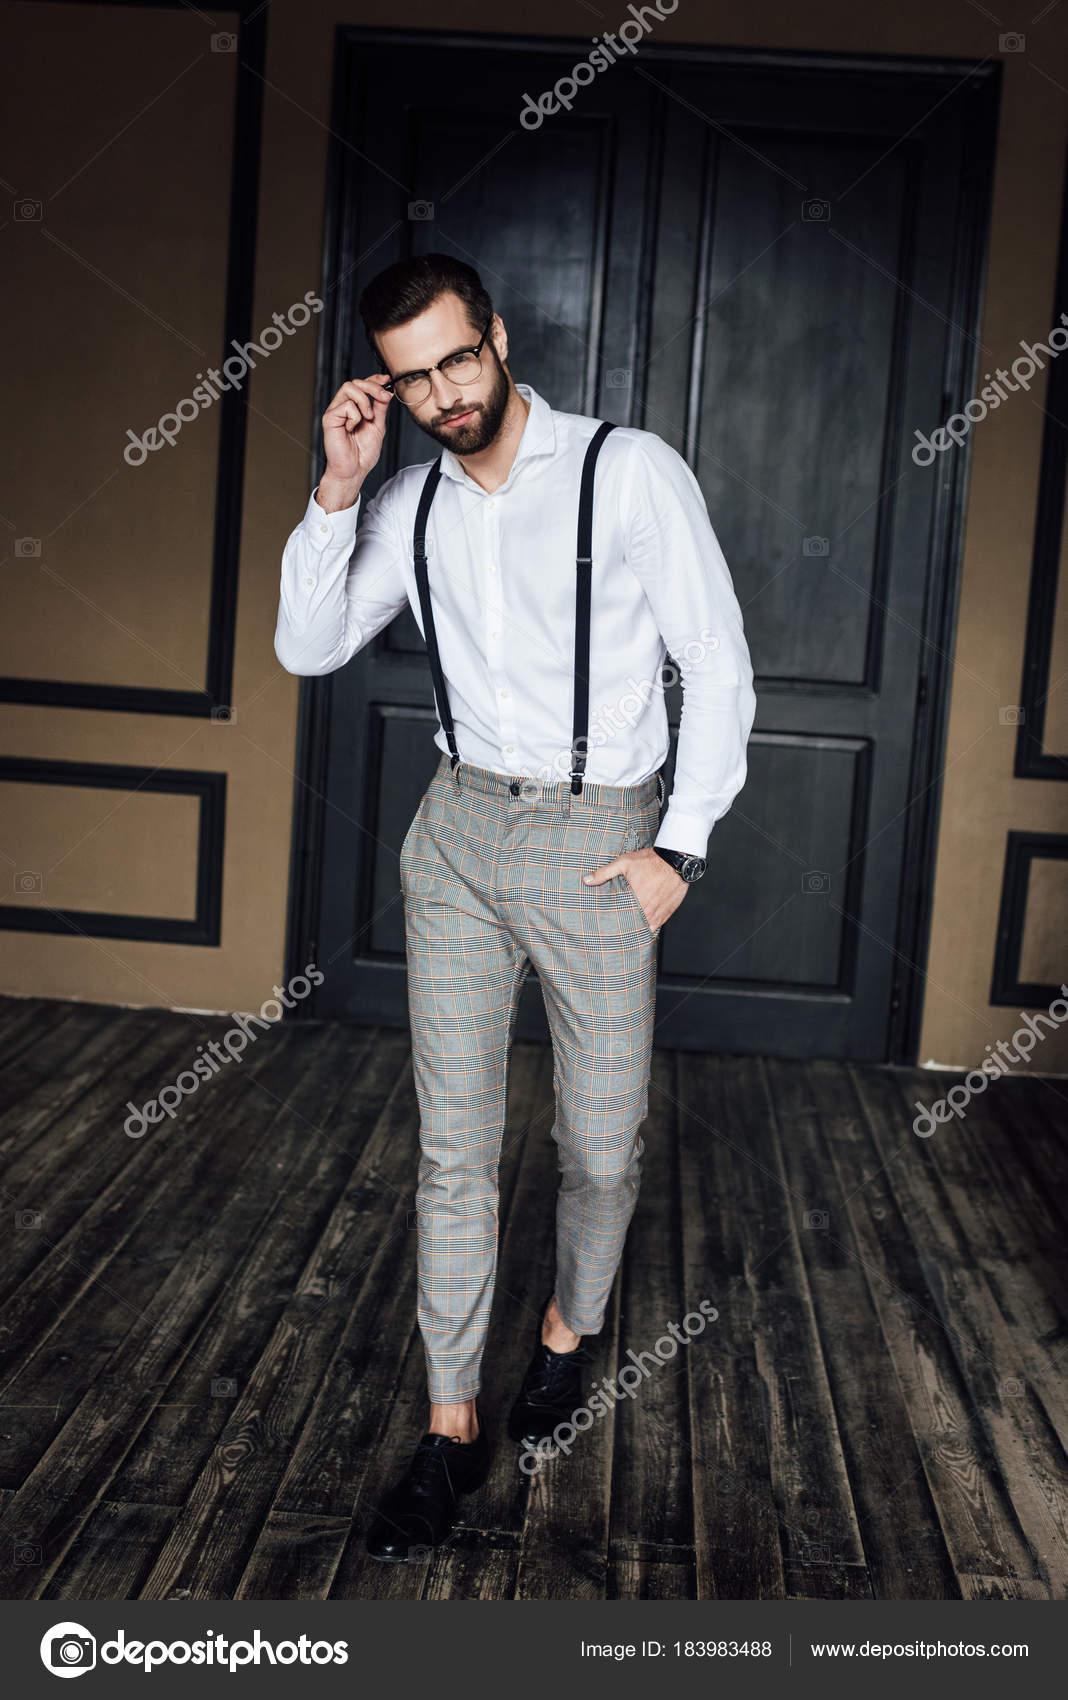 Fotos Tirantes Moda Hombre Elegante Posando Camisa Blanca